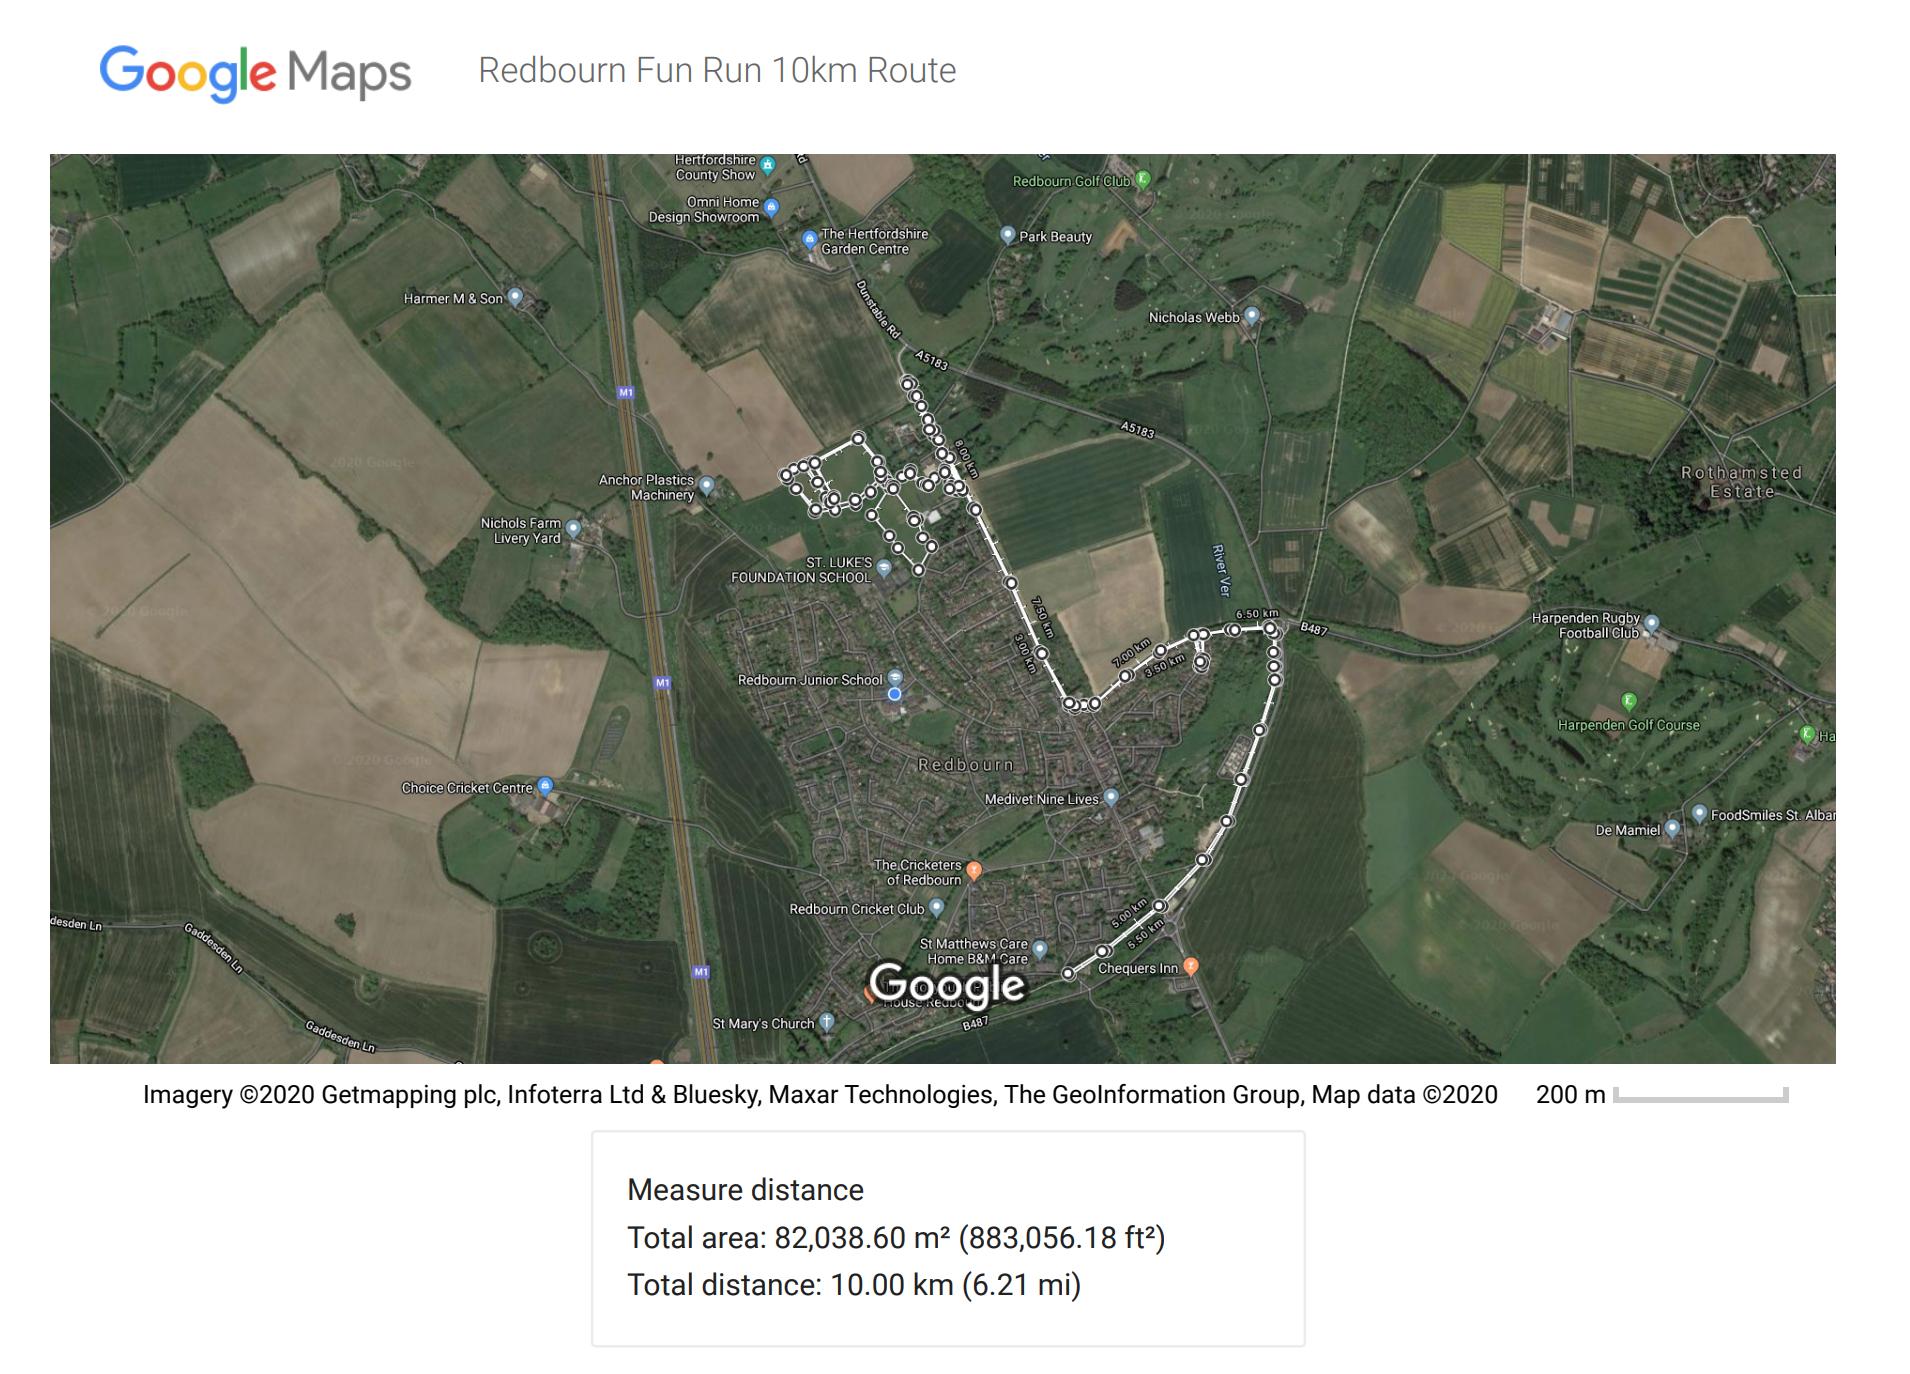 redbourn fun run 10km route